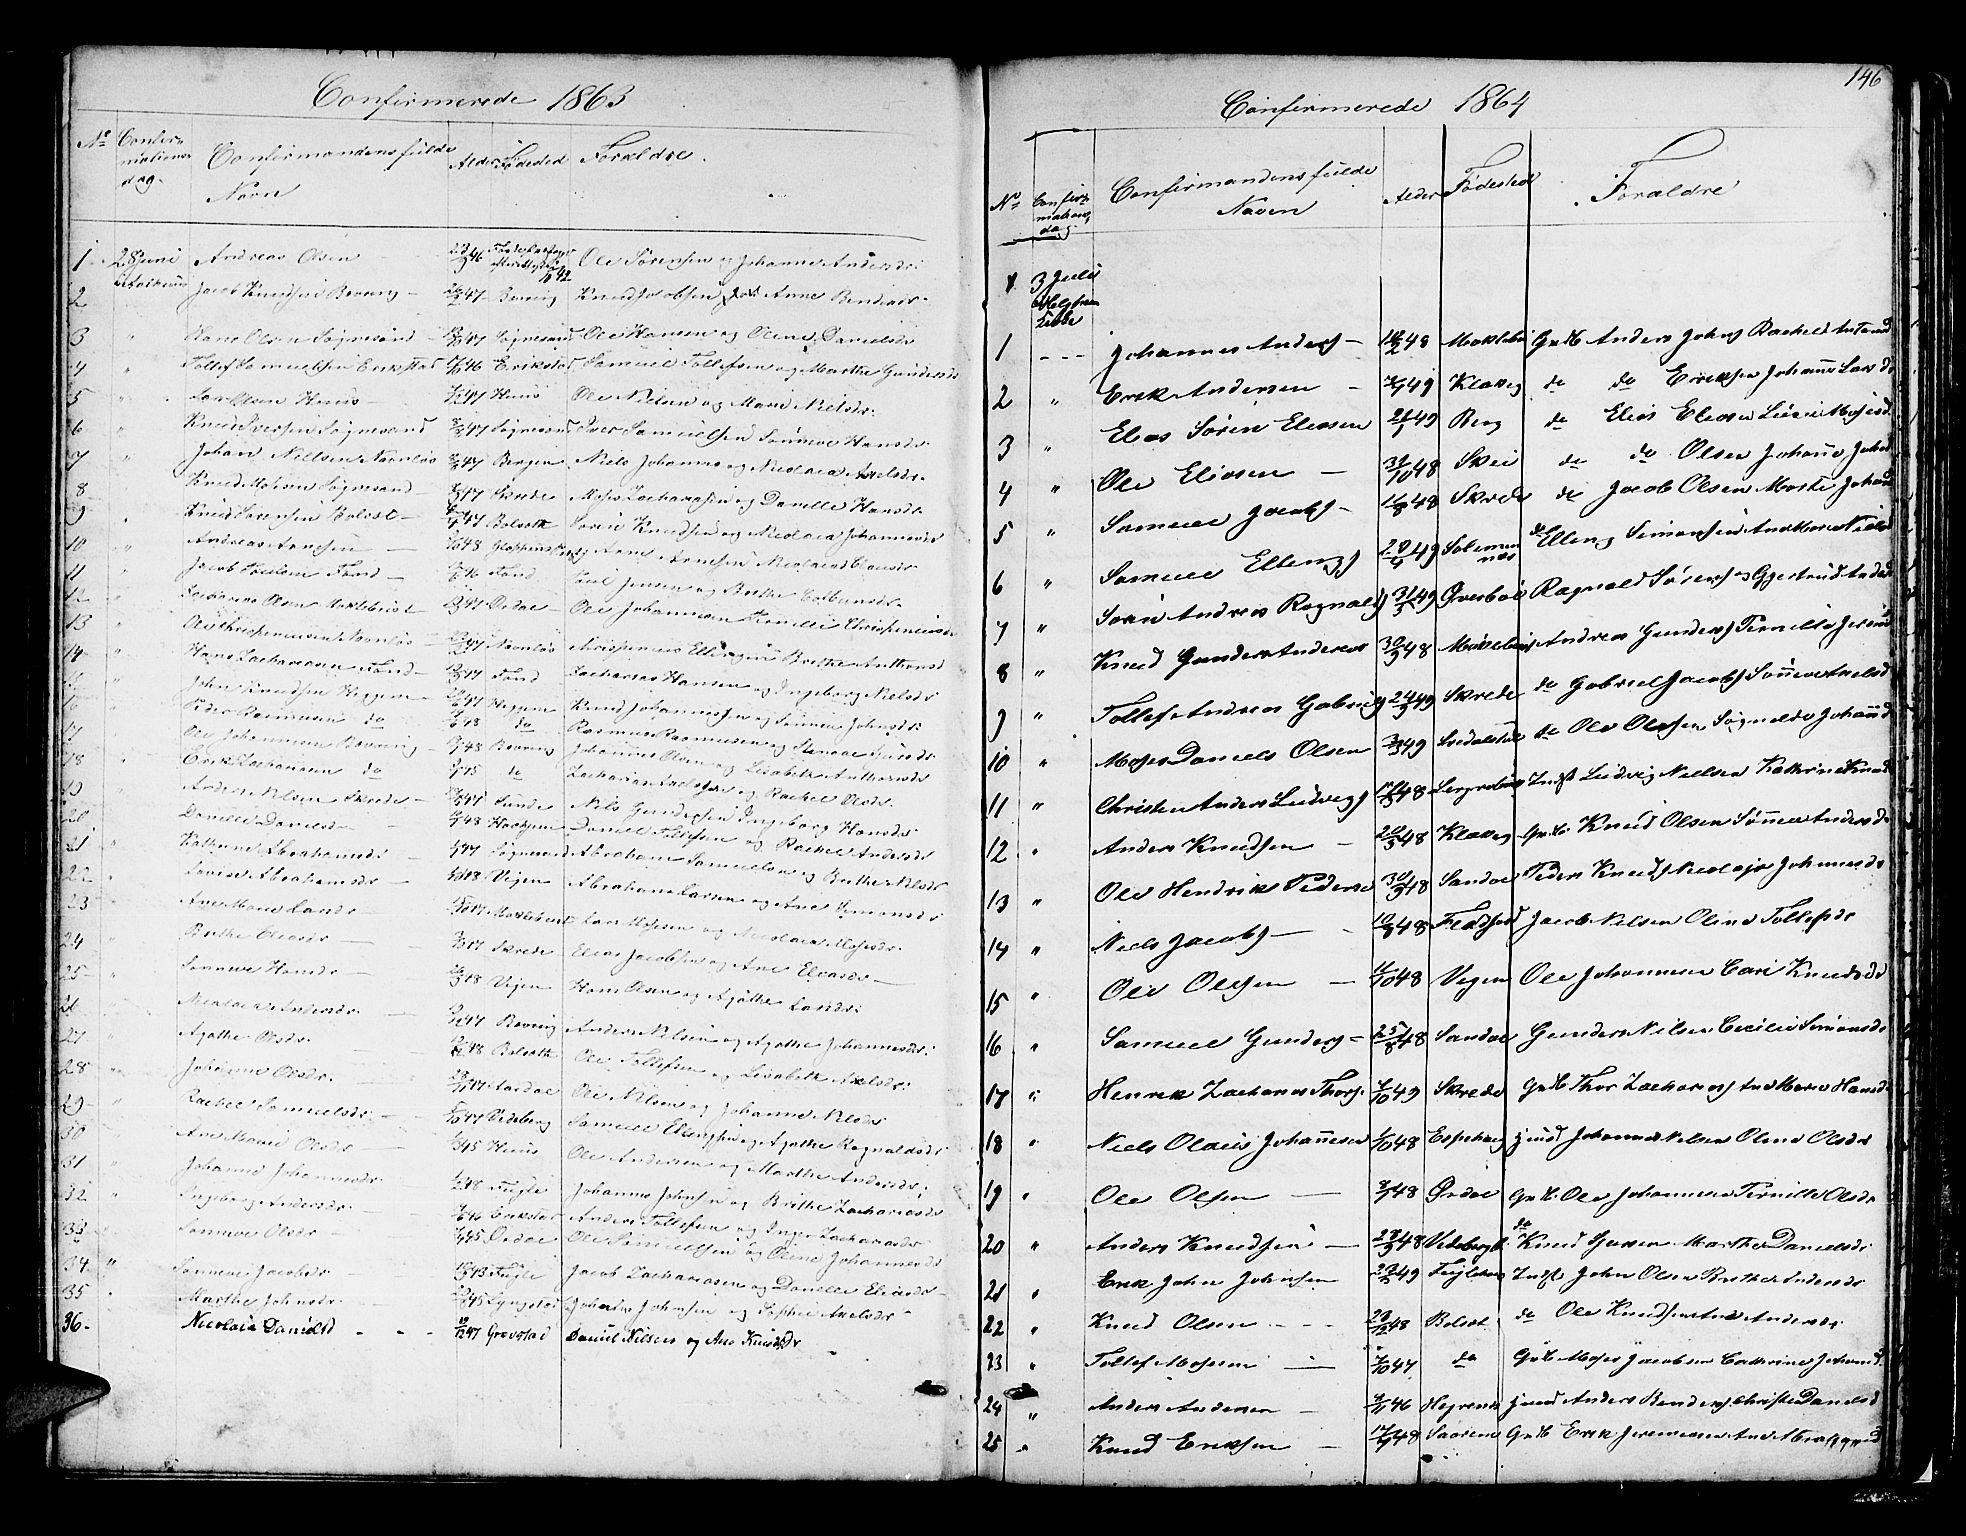 SAB, Jølster sokneprestembete, H/Hab/Habb/L0001: Klokkerbok nr. B 1, 1853-1887, s. 146